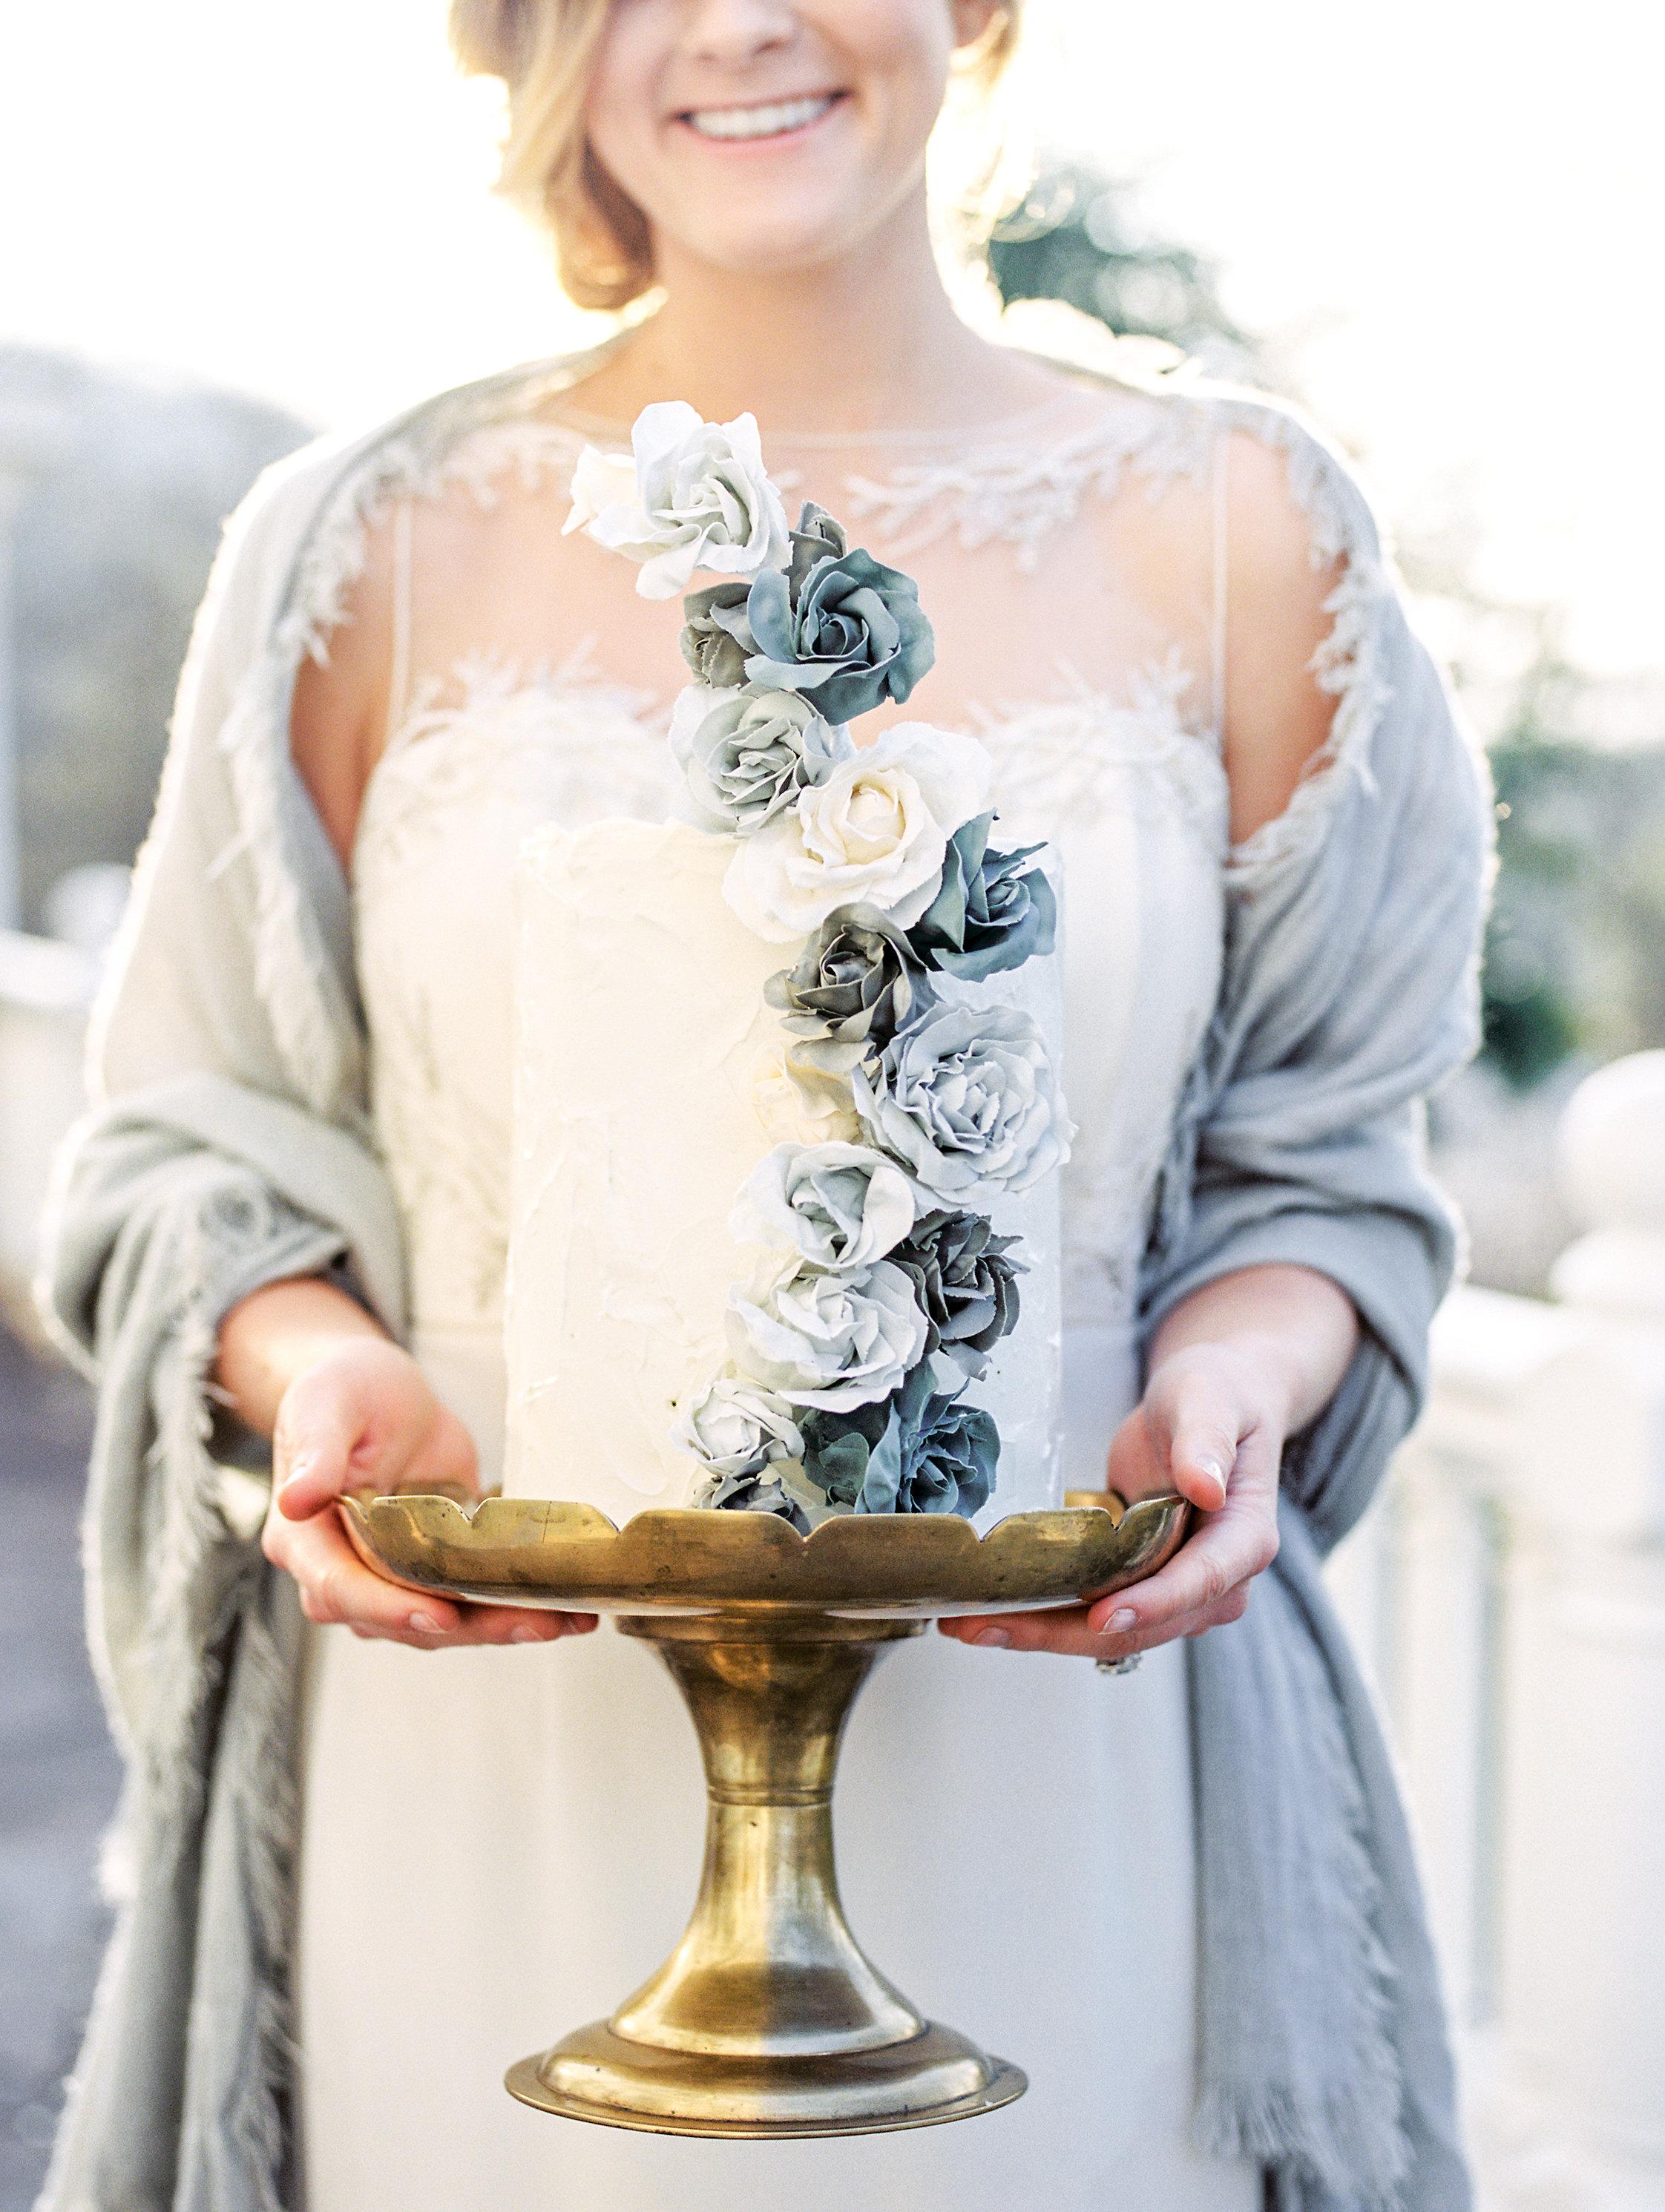 Photography: Lissa Ryan Photography | Planning: The Velvet Veil | Paper & Calligraphy: Spurlé Gul Studio | Cake Catherine George Cakes